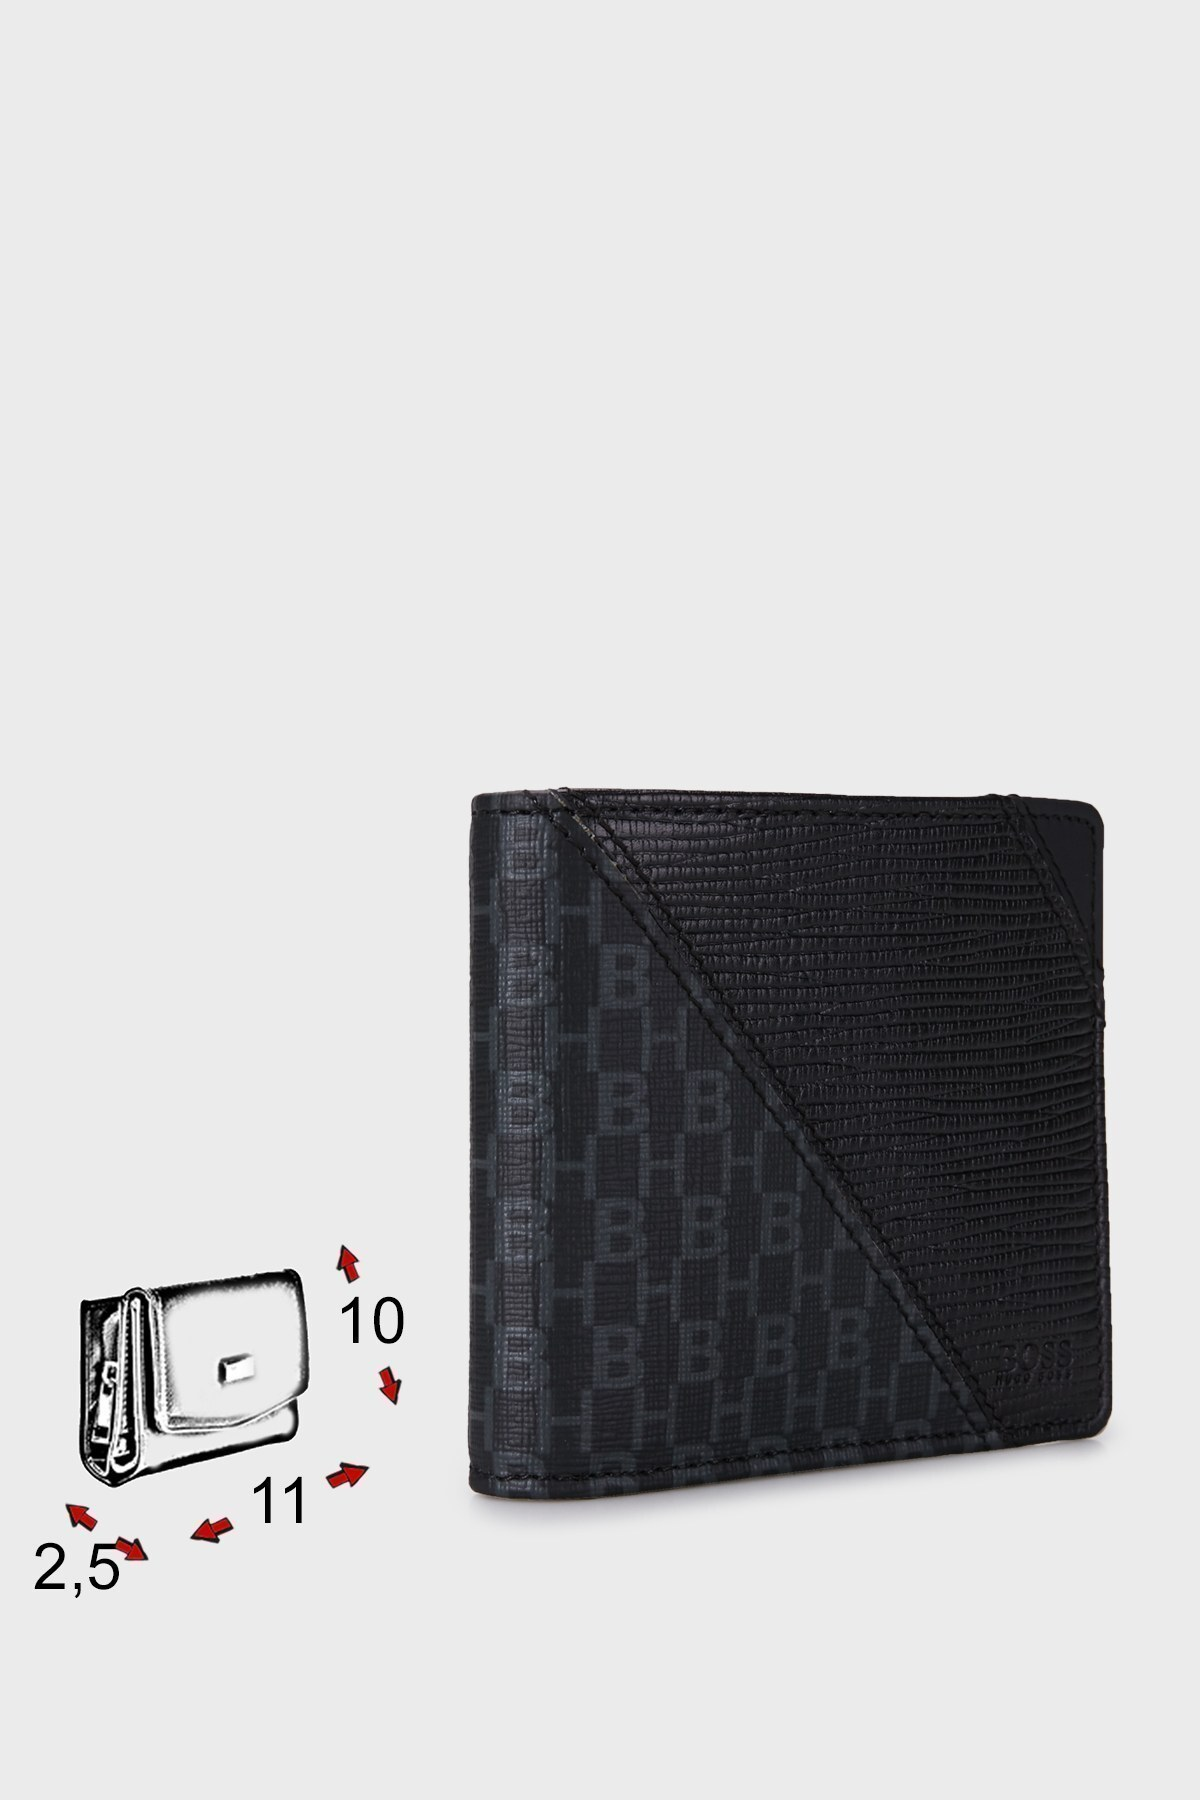 Hugo Boss Logolu Deri Erkek Cüzdan 50449858 001 SİYAH